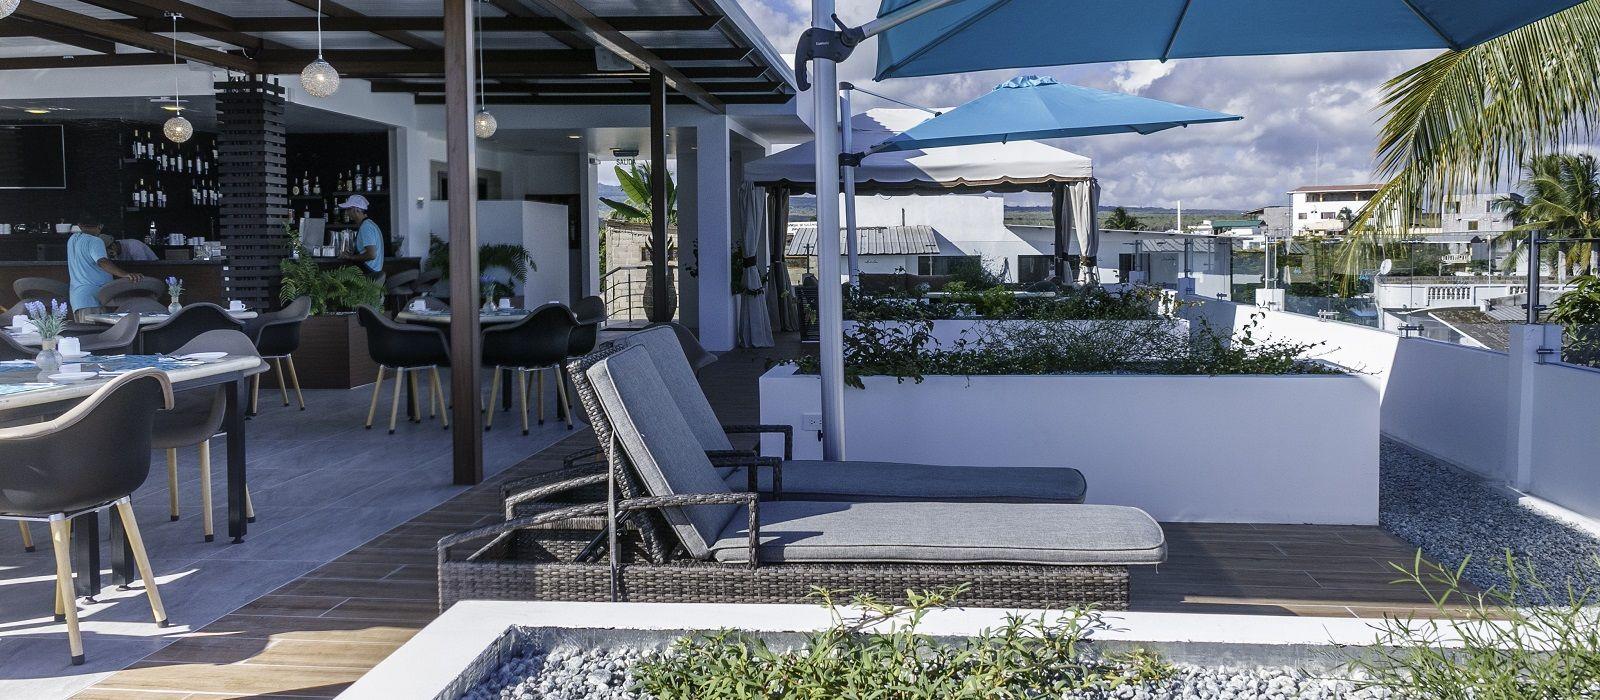 Hotel Ikala Ecuador/Galapagos